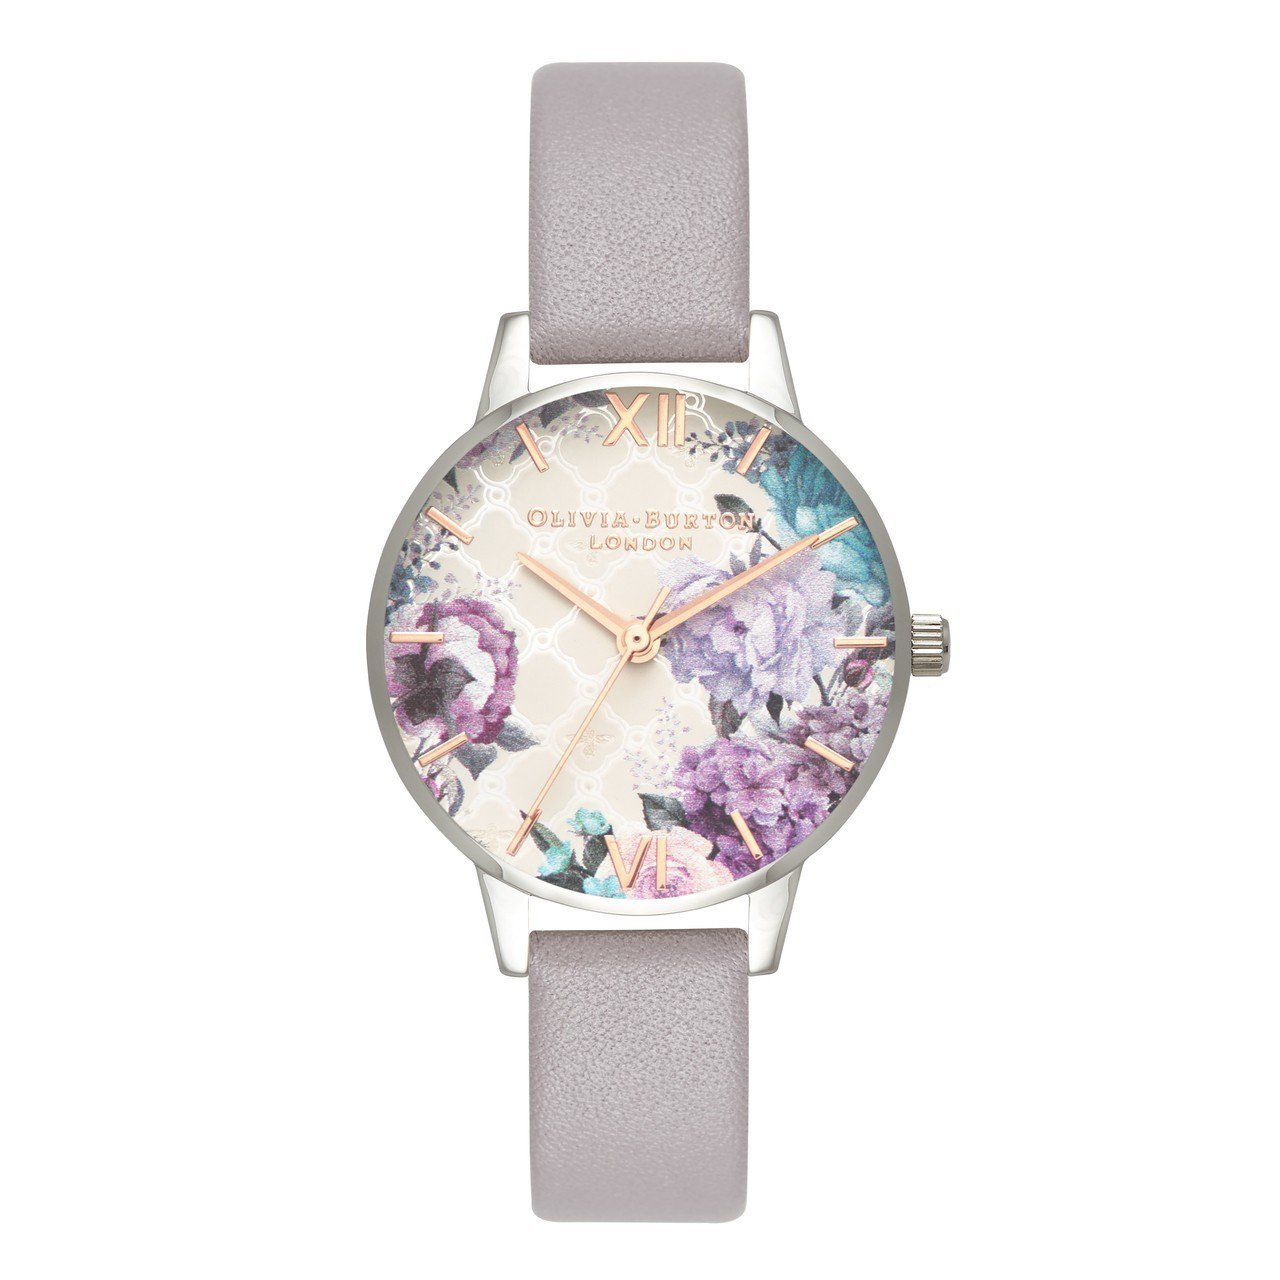 Olivia Burton秋冬Glasshouse系列 Grey Lilac R...